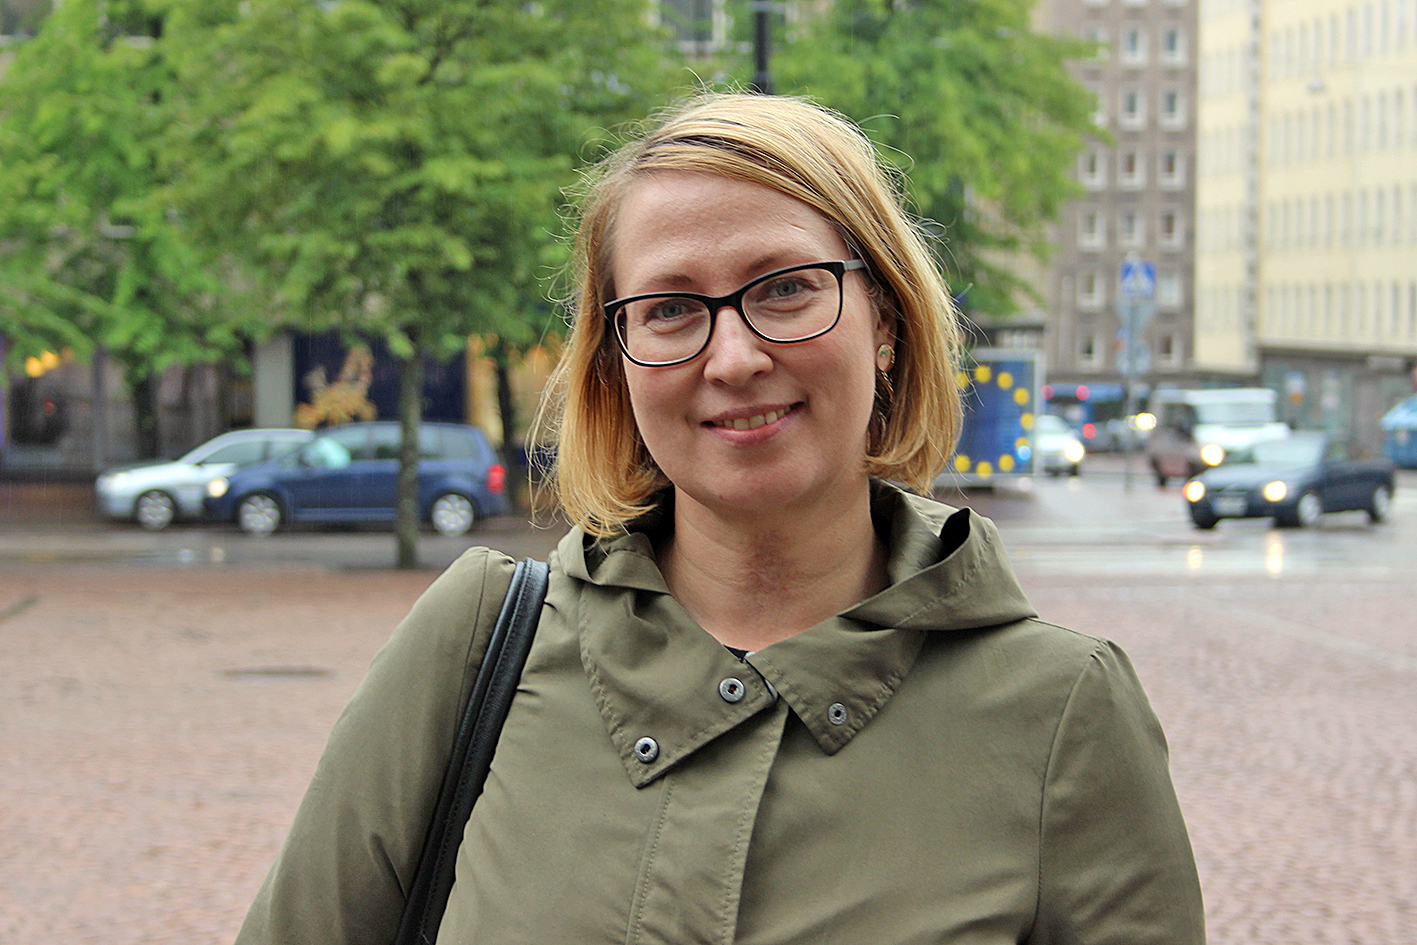 SLC - Mia Wikstrom